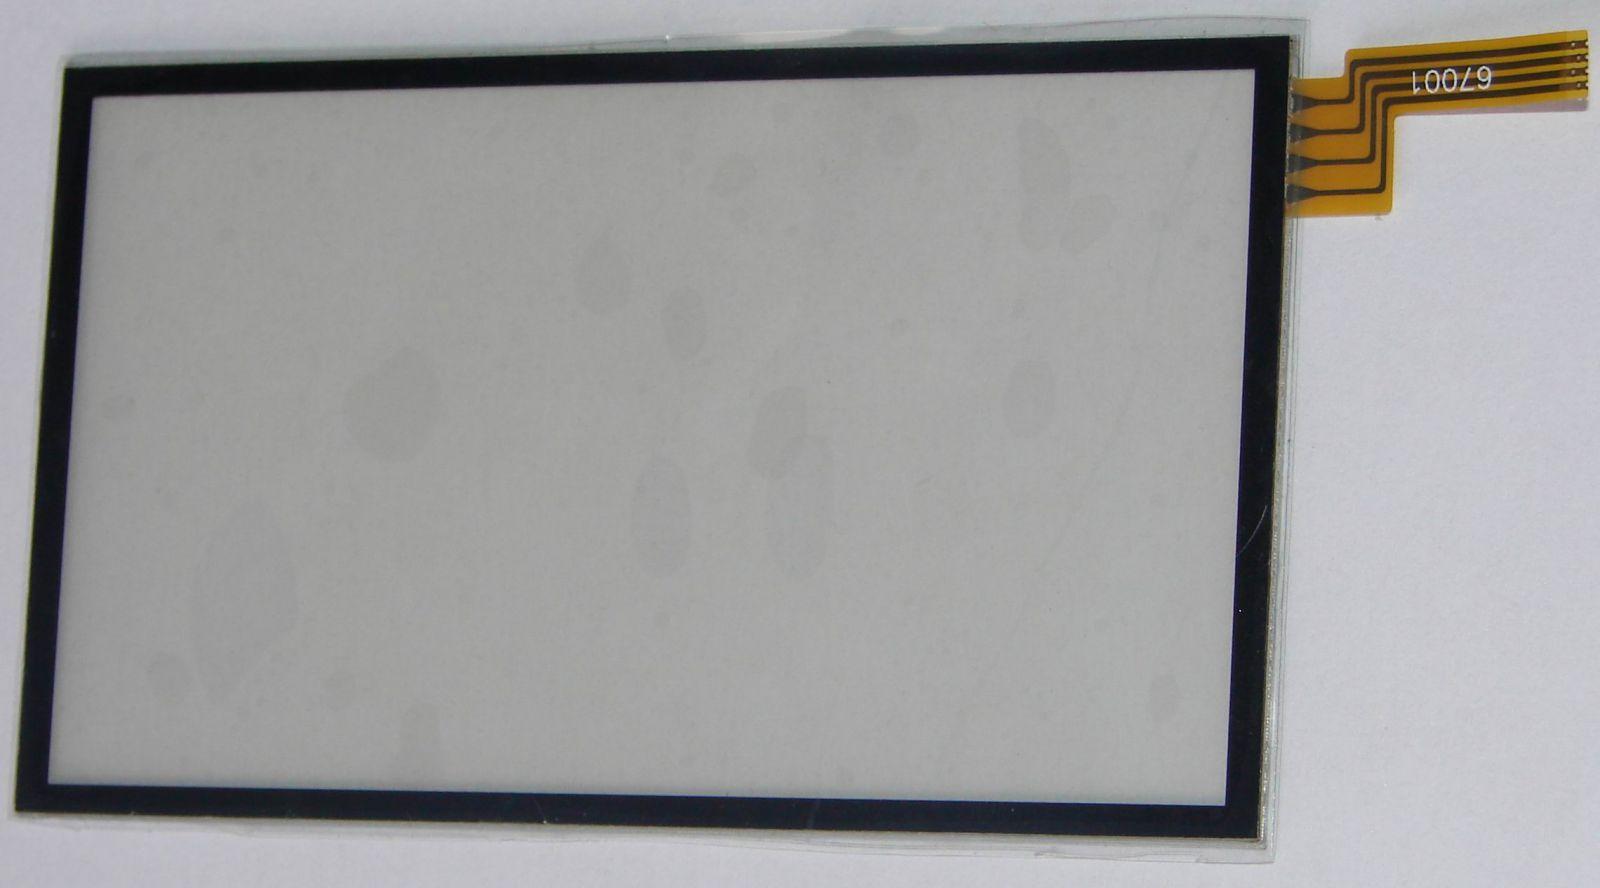 AG防眩玻璃